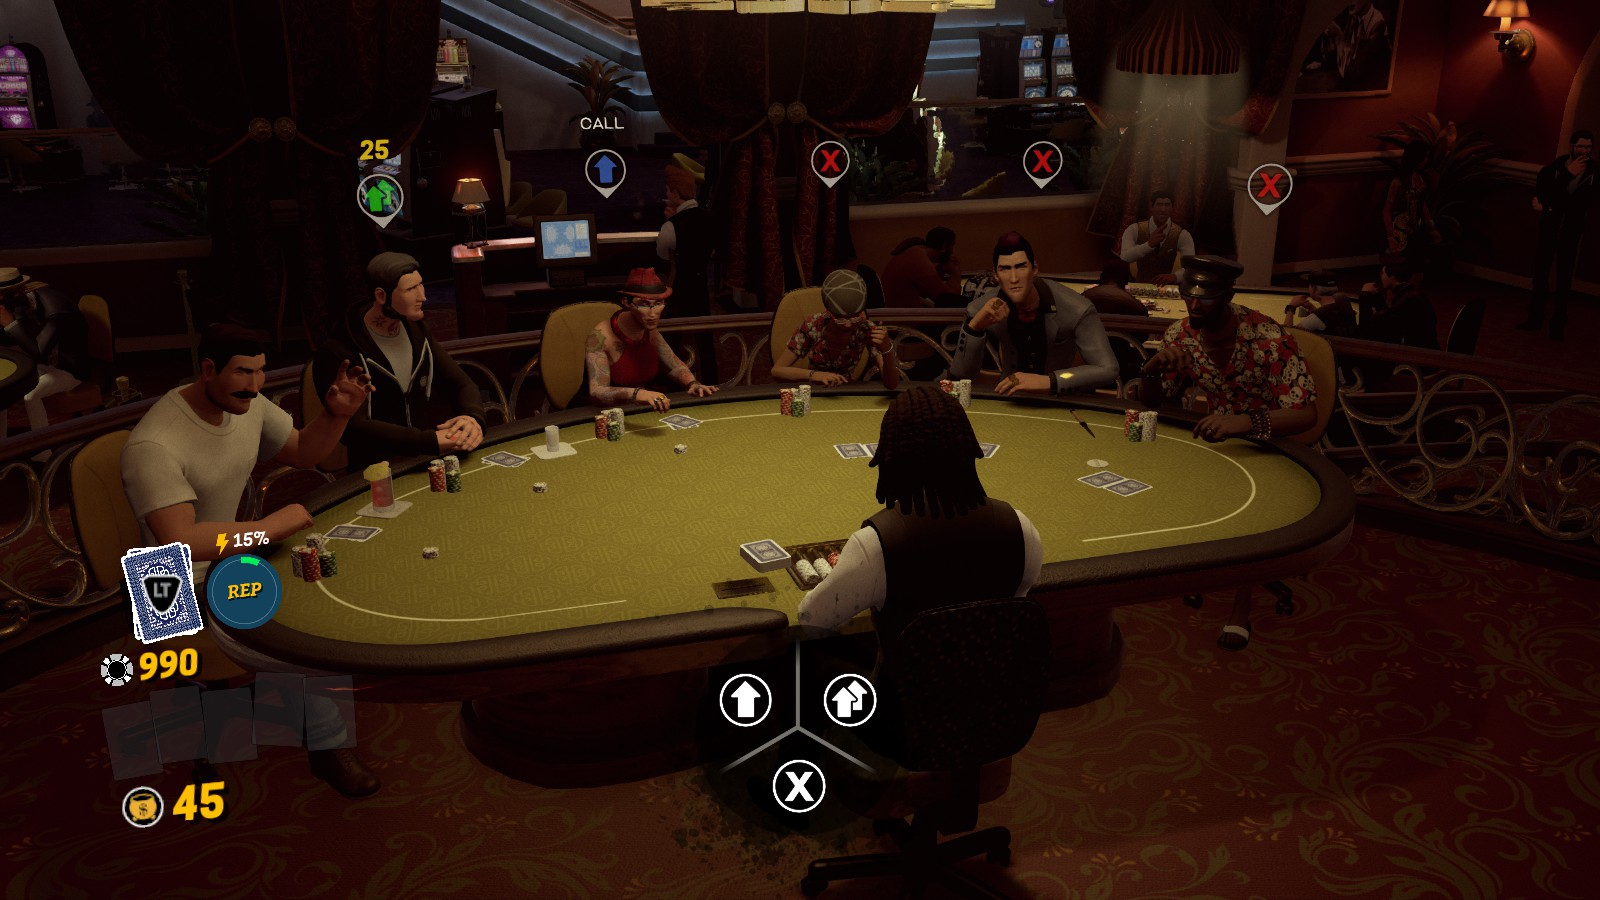 Prominence_Poker_505_Games_Deck_Casino_Screen_6